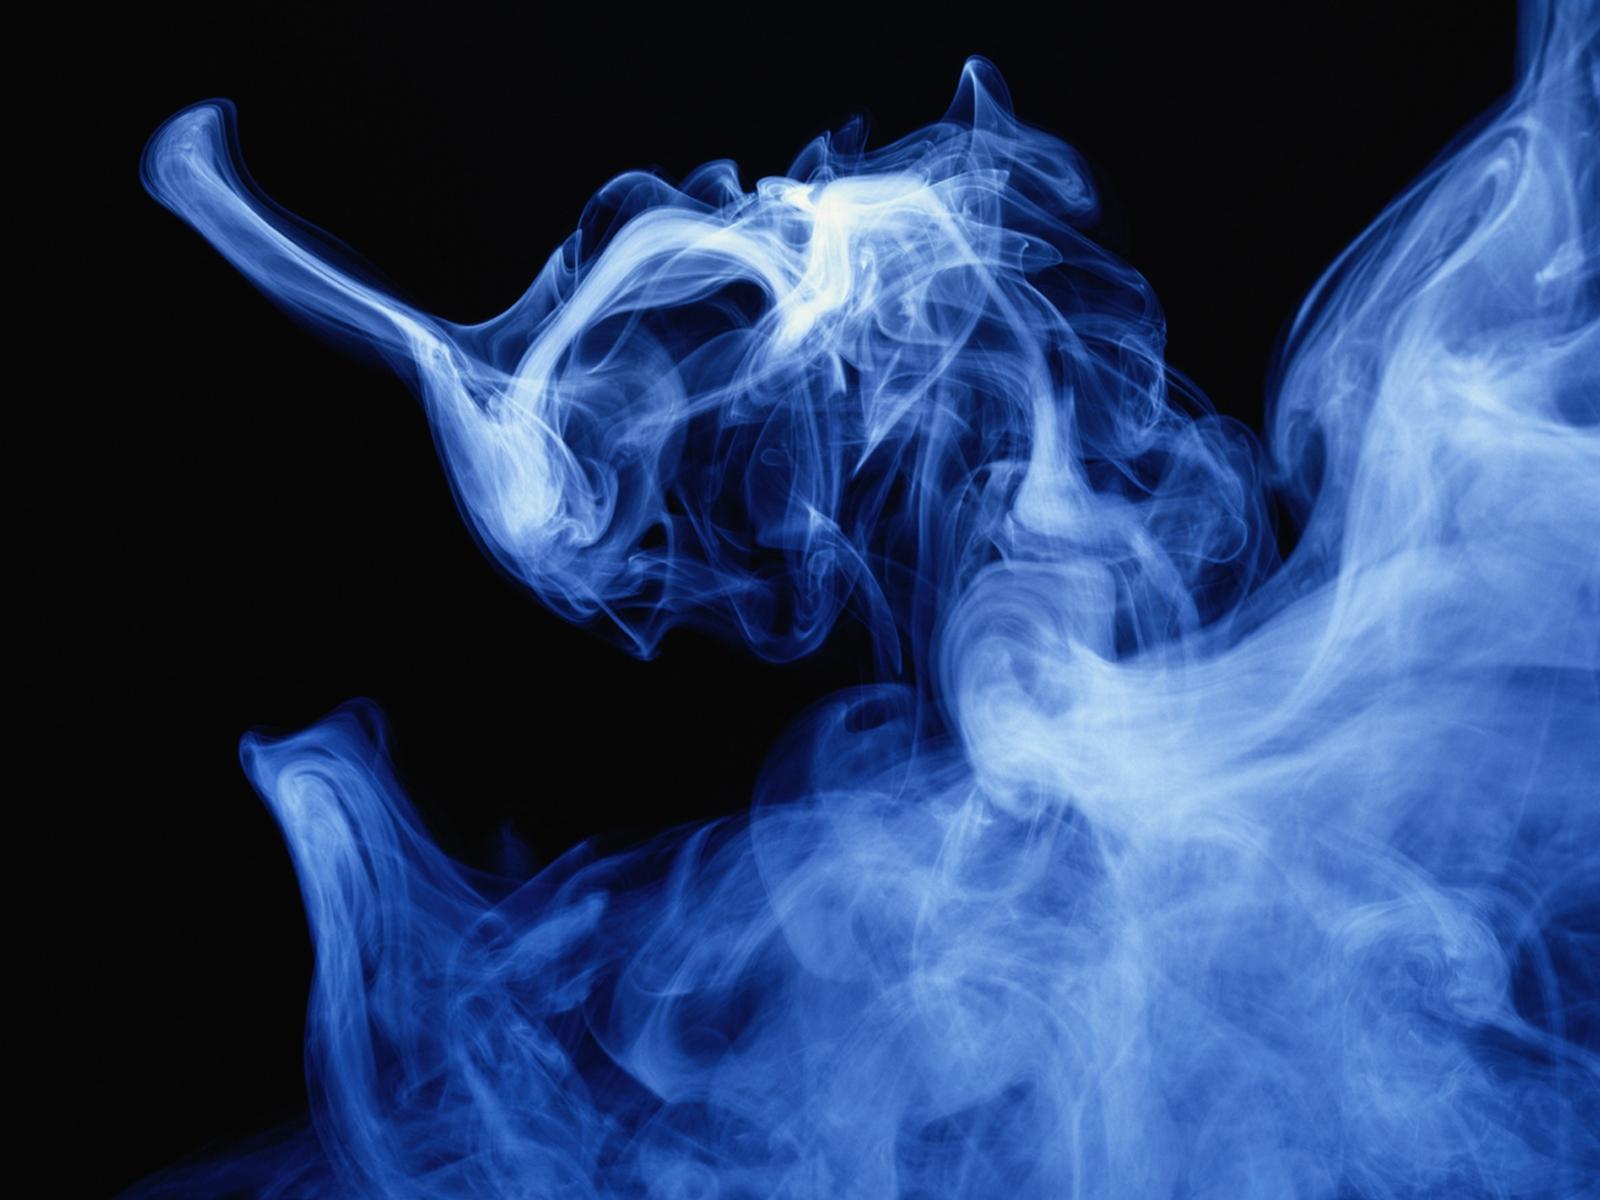 ... blue-smoke-hd-wallpapers ...